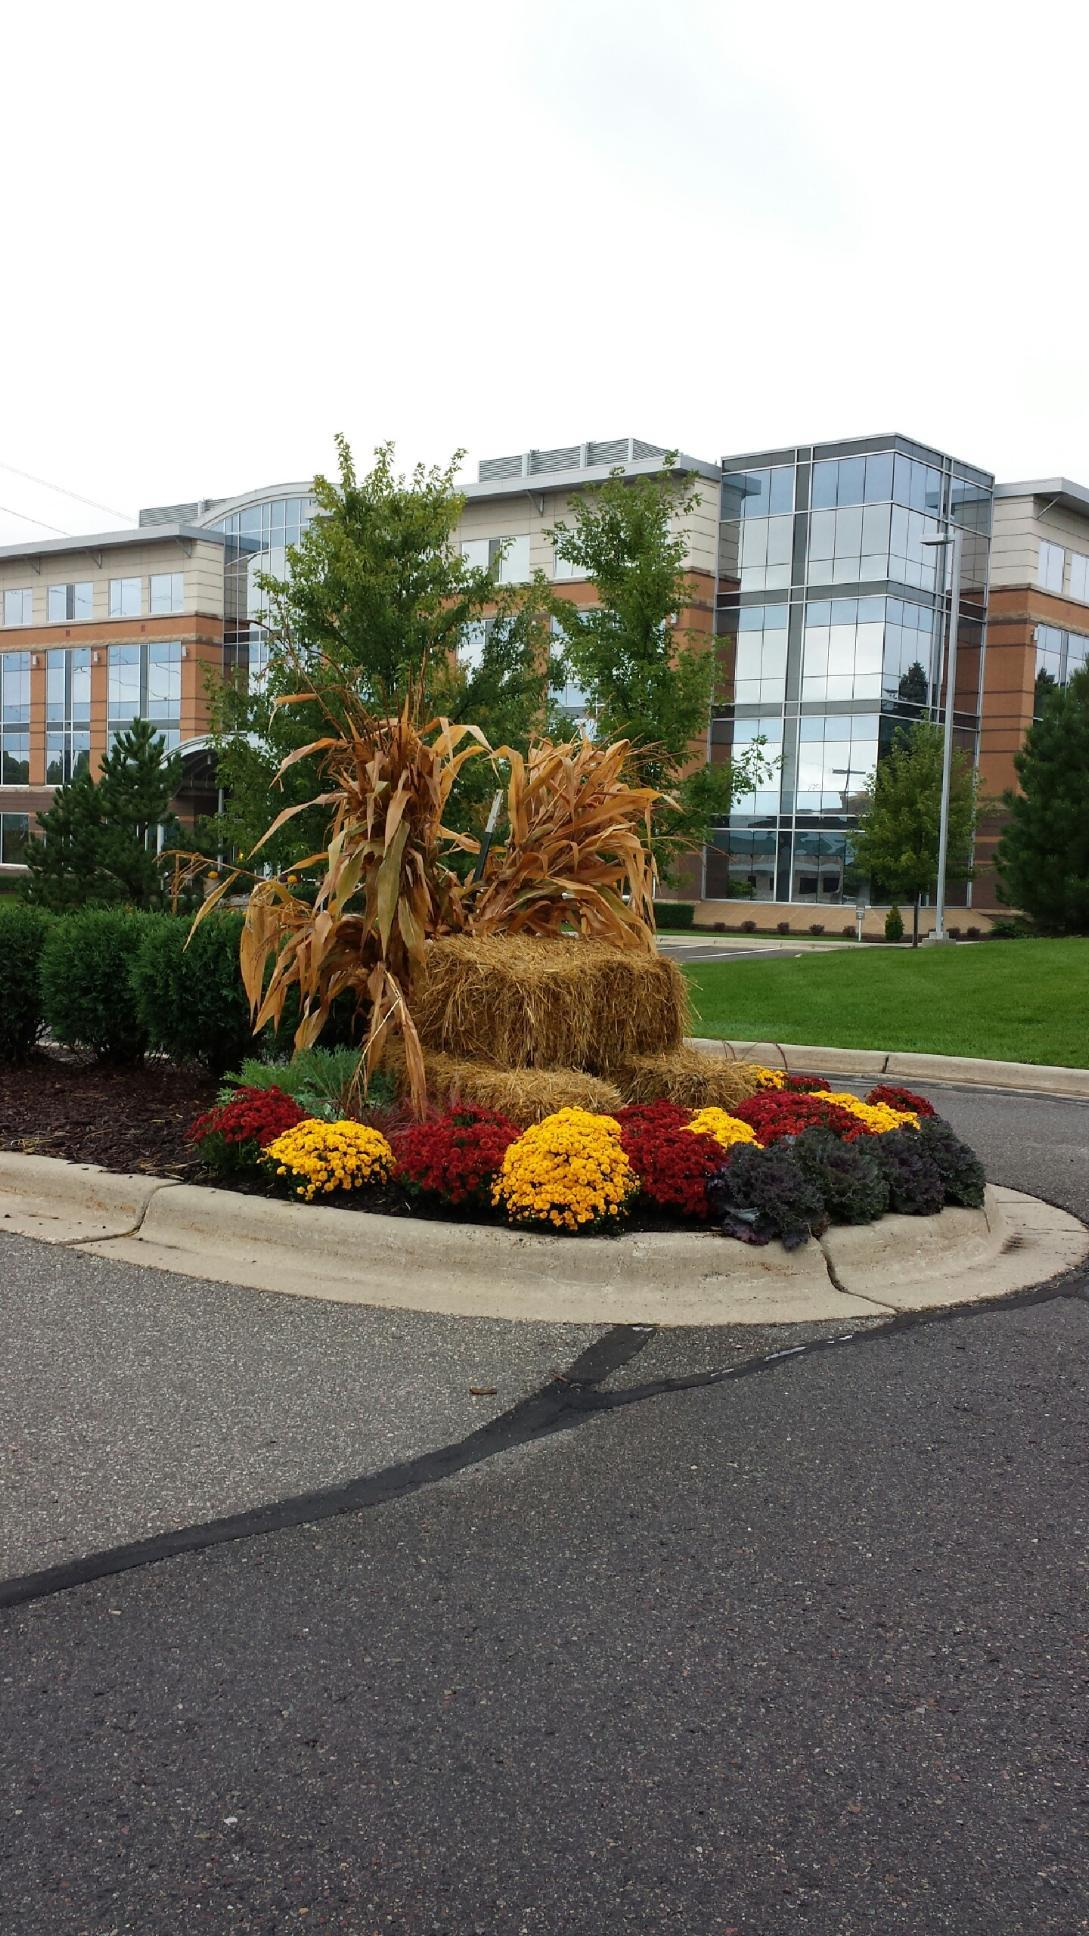 Commercial - Curbside Landscape